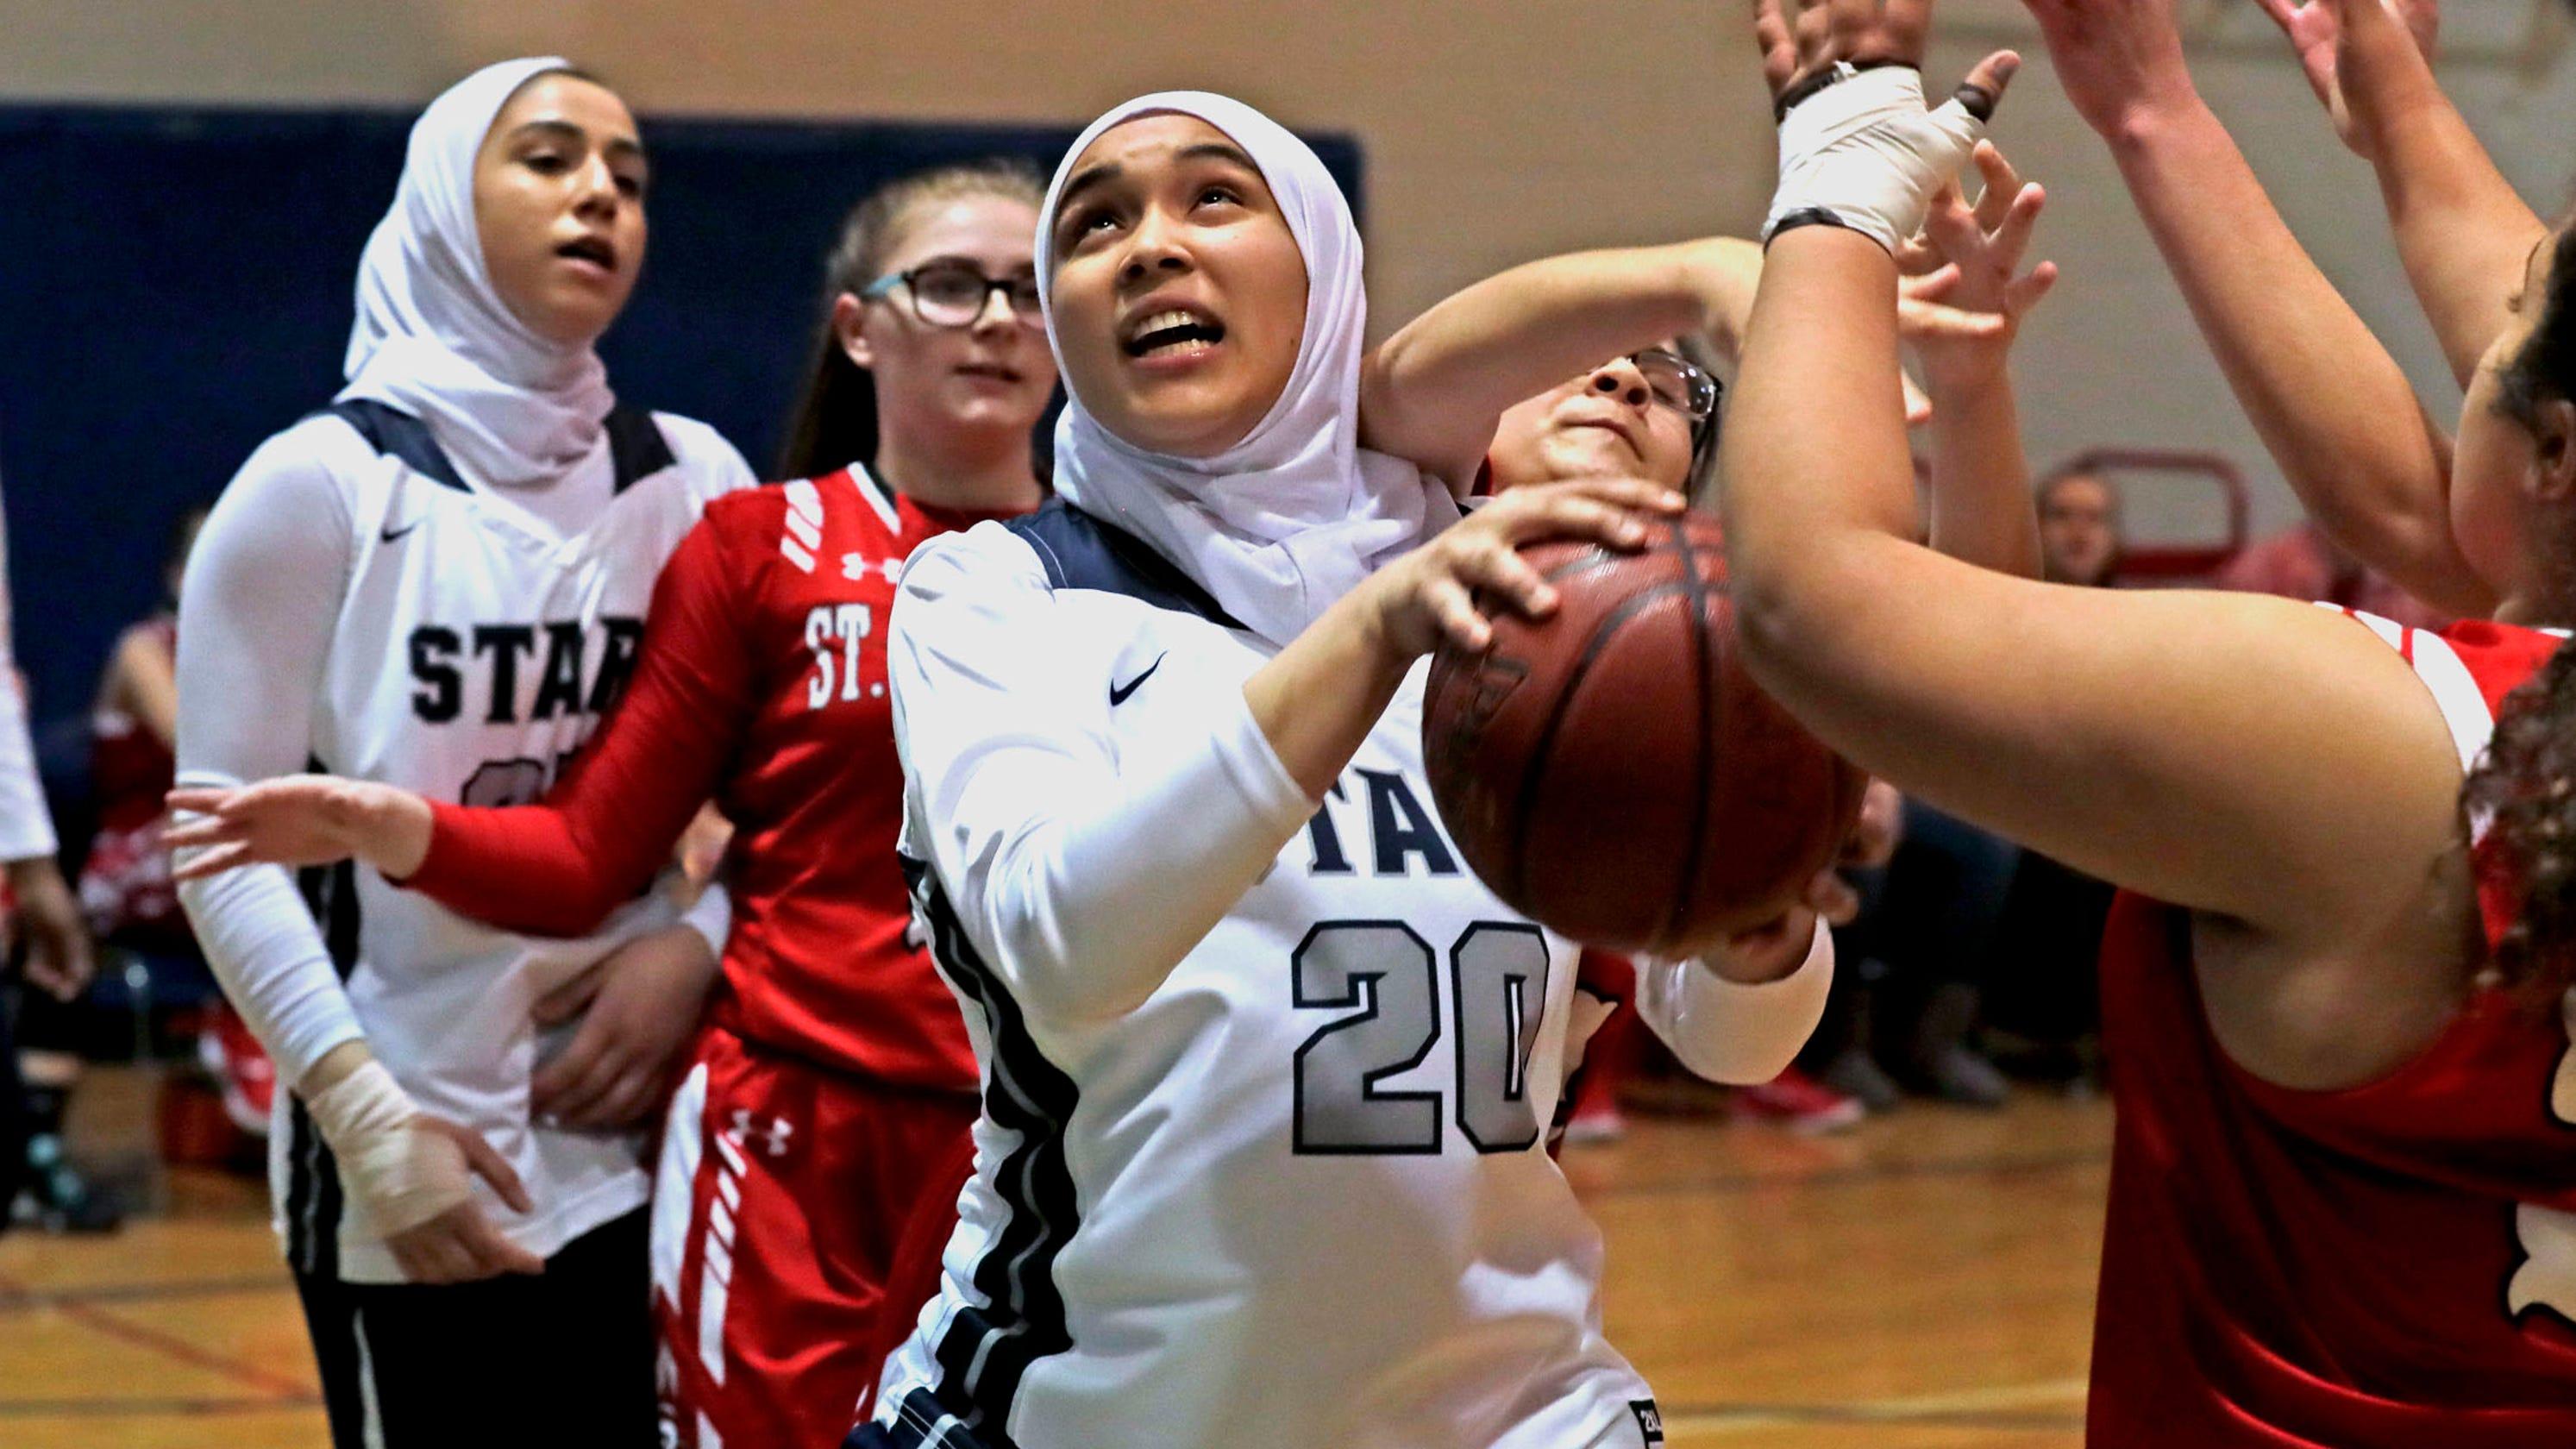 salam school s winning girls basketball team shatters stereotypes